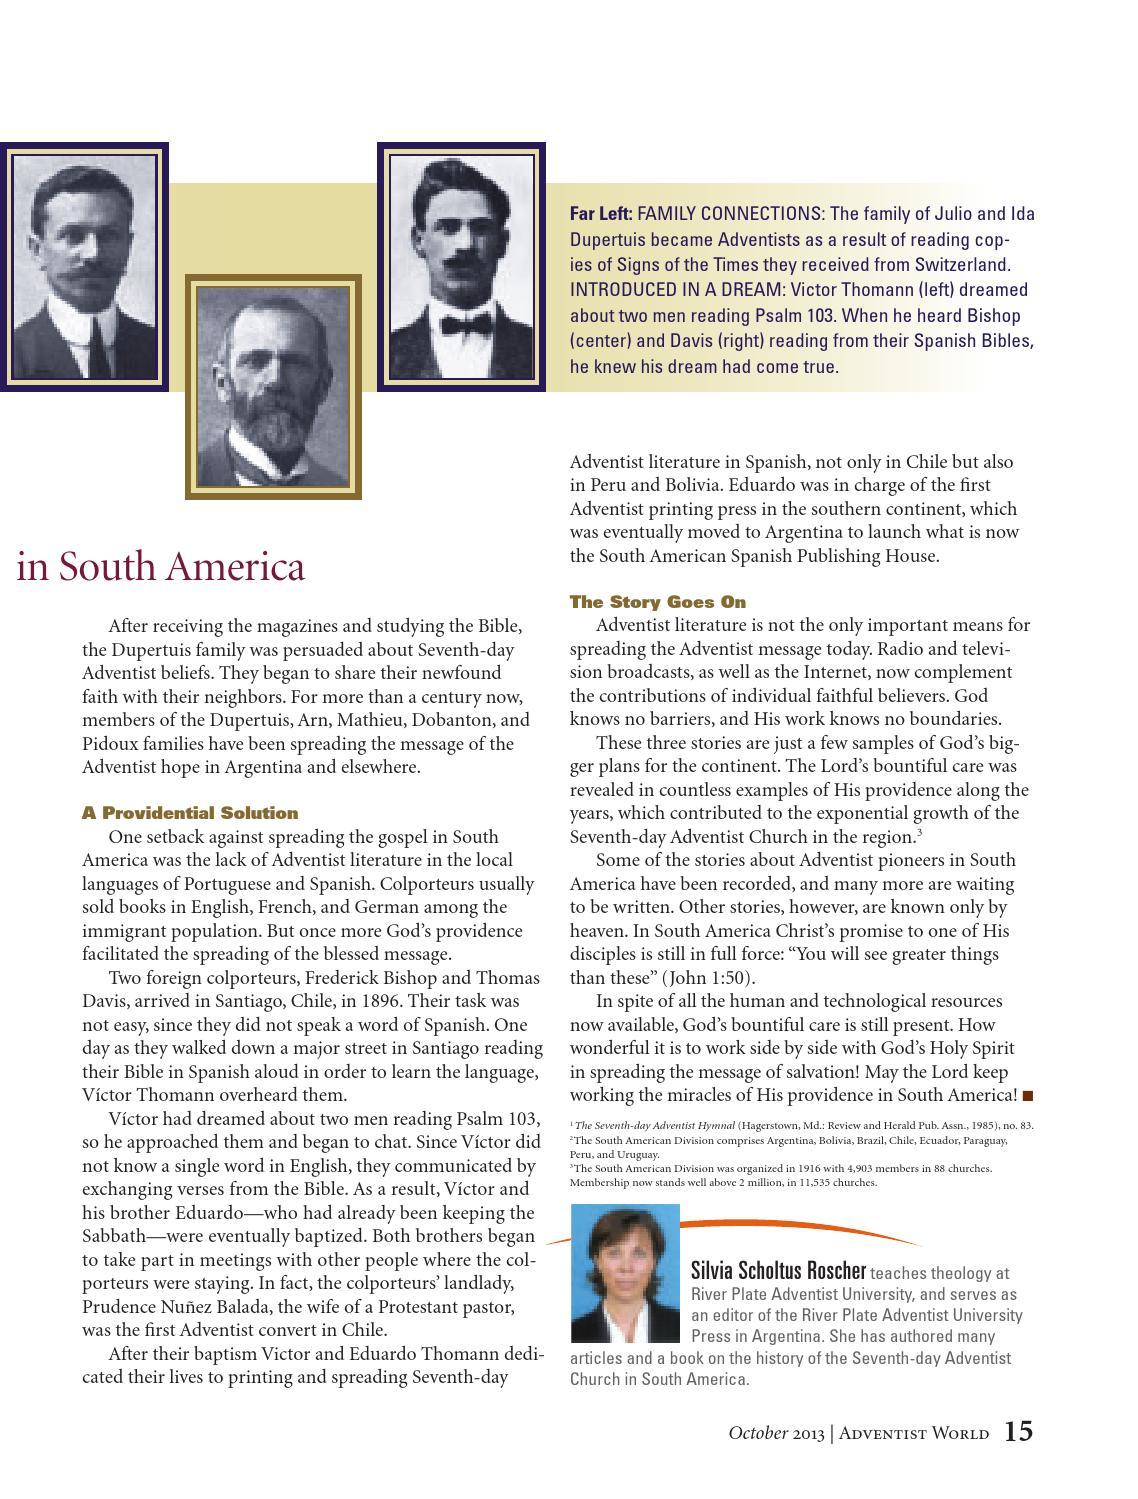 Adventist World - October 12, 2013 by Adventist Record - issuu